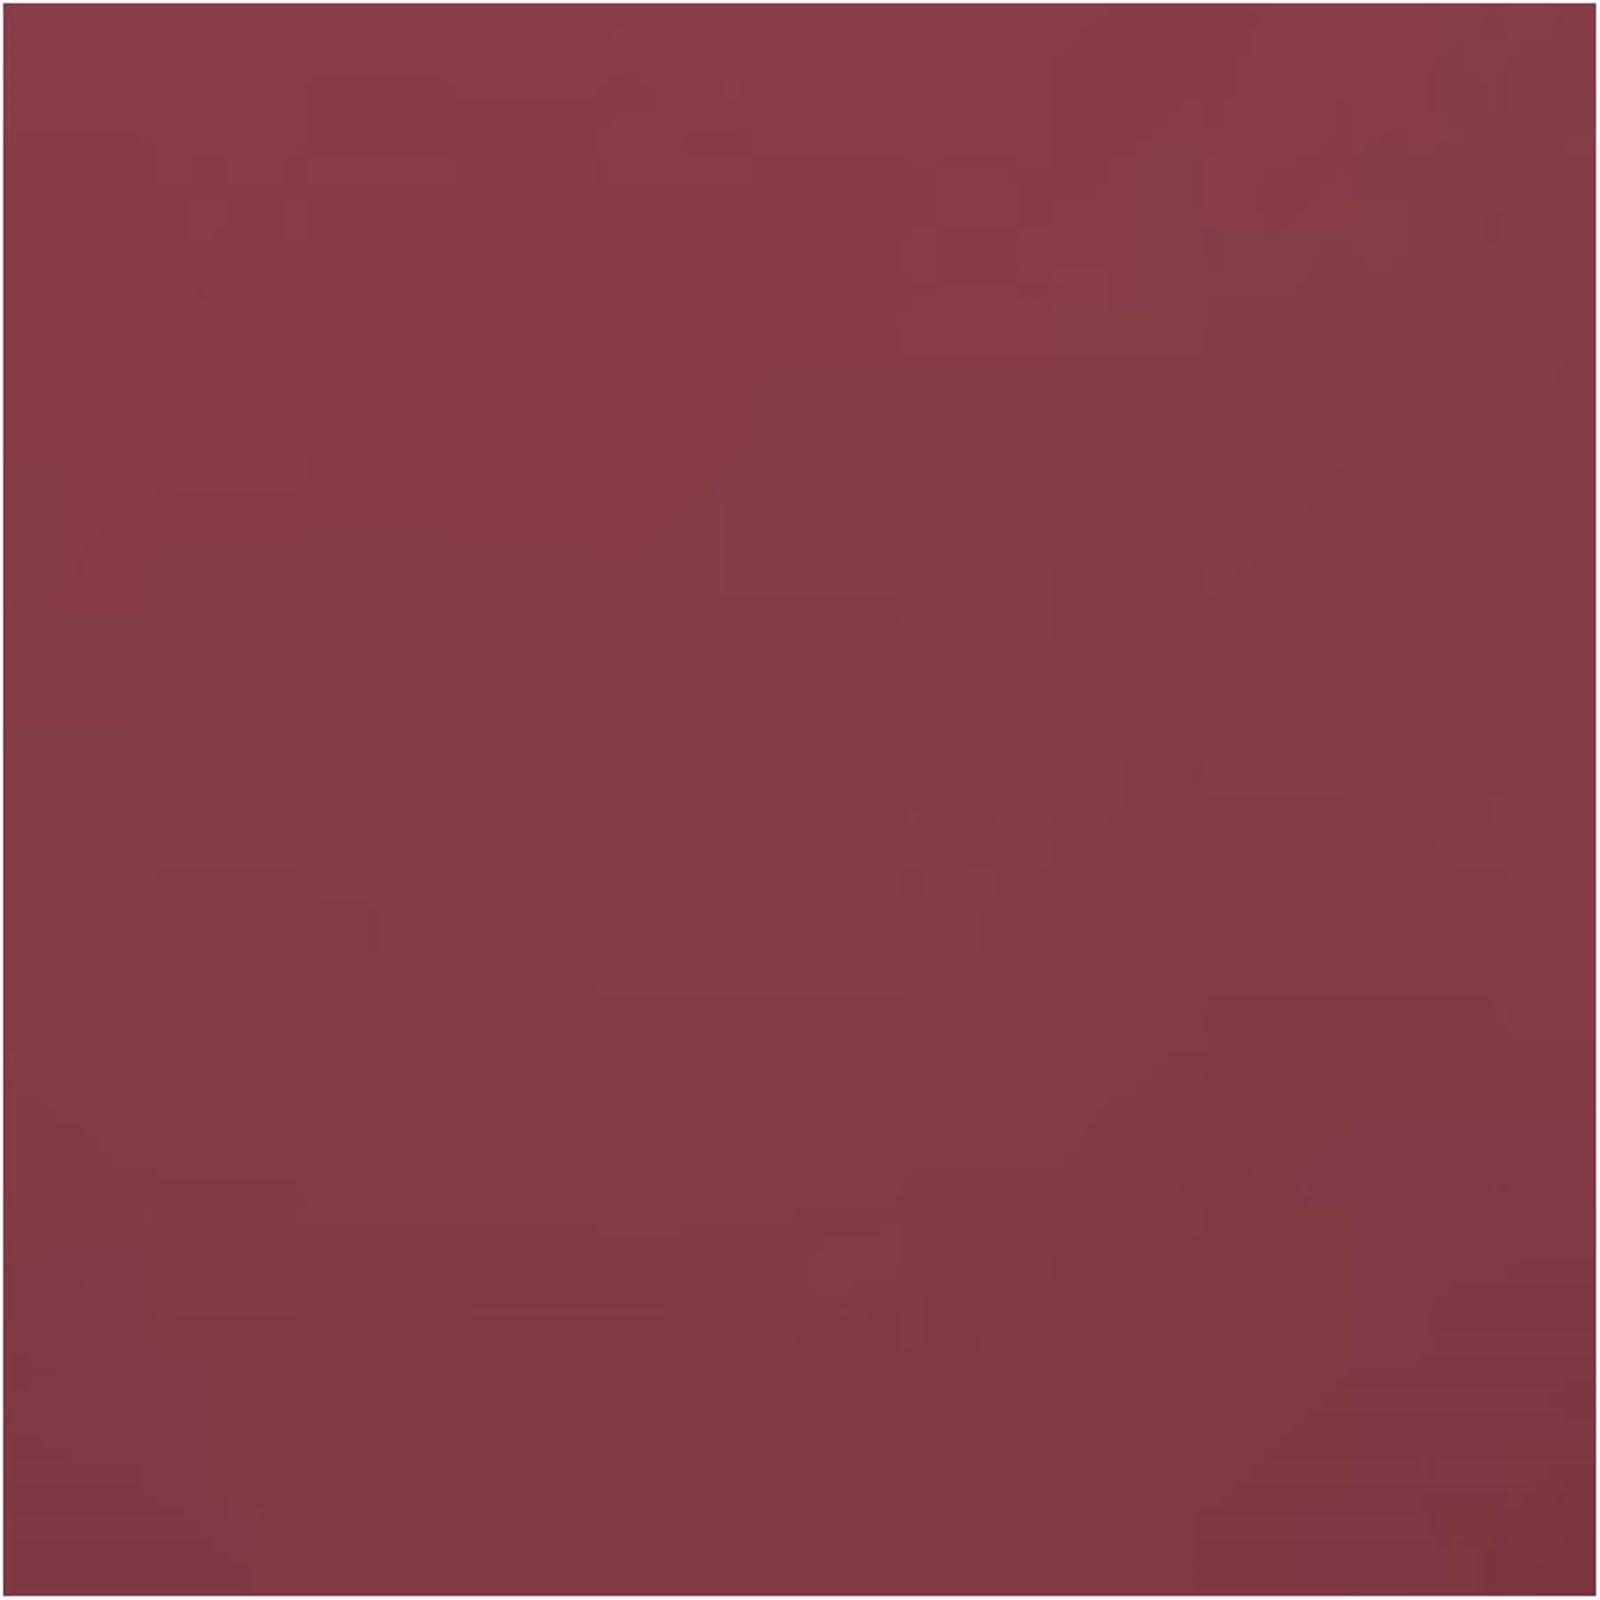 decor soft rosu Burgundy